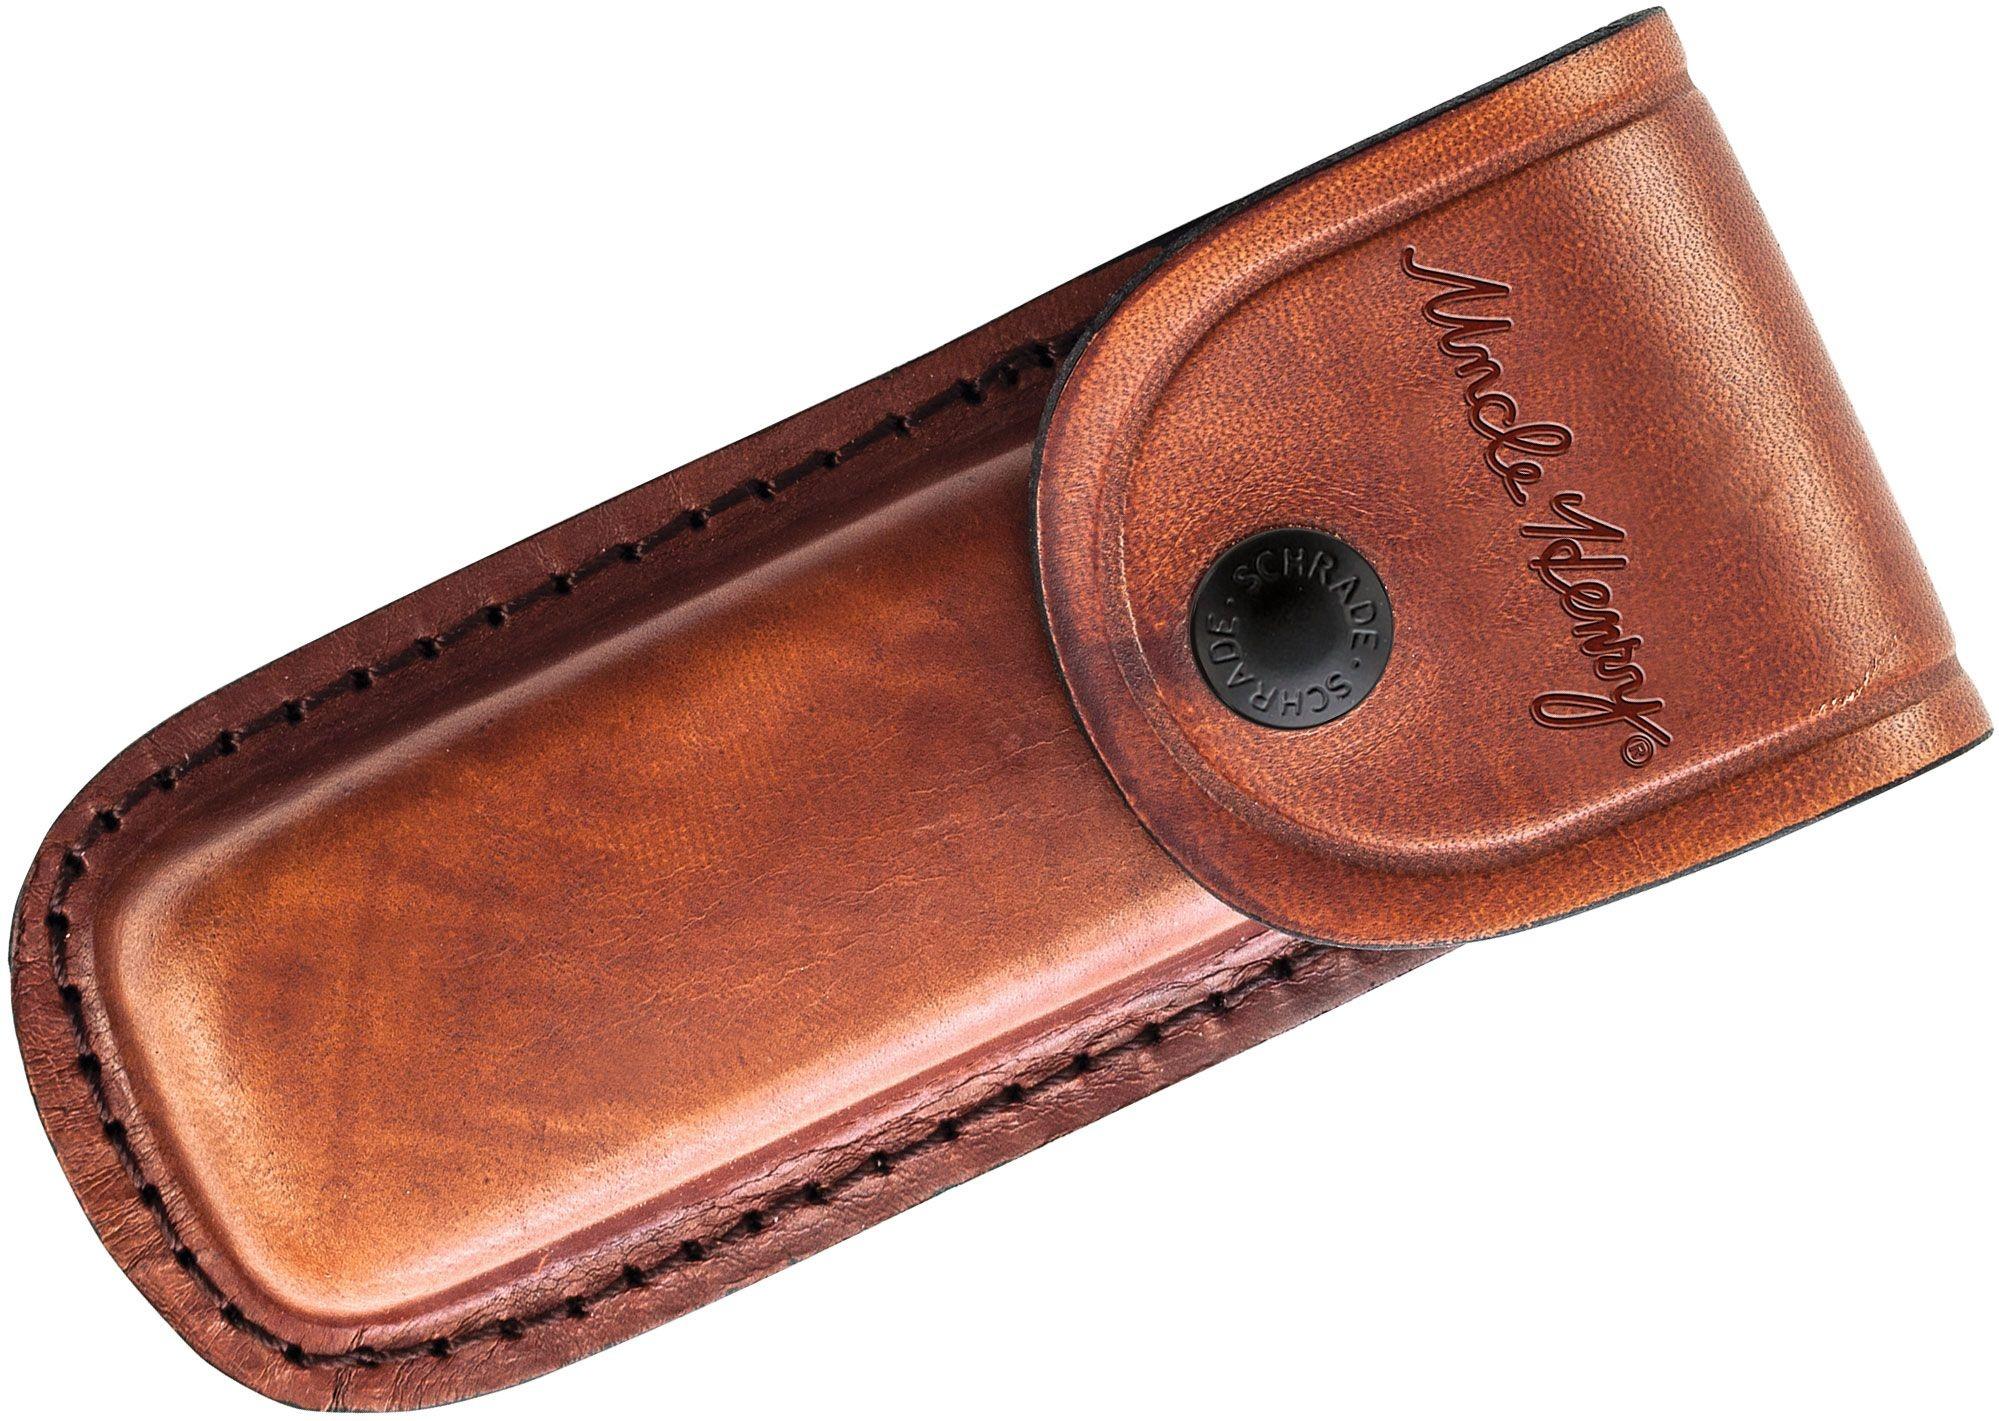 "Uncle Henry Bear Paw 5"" Lockback with Leather Sheath"